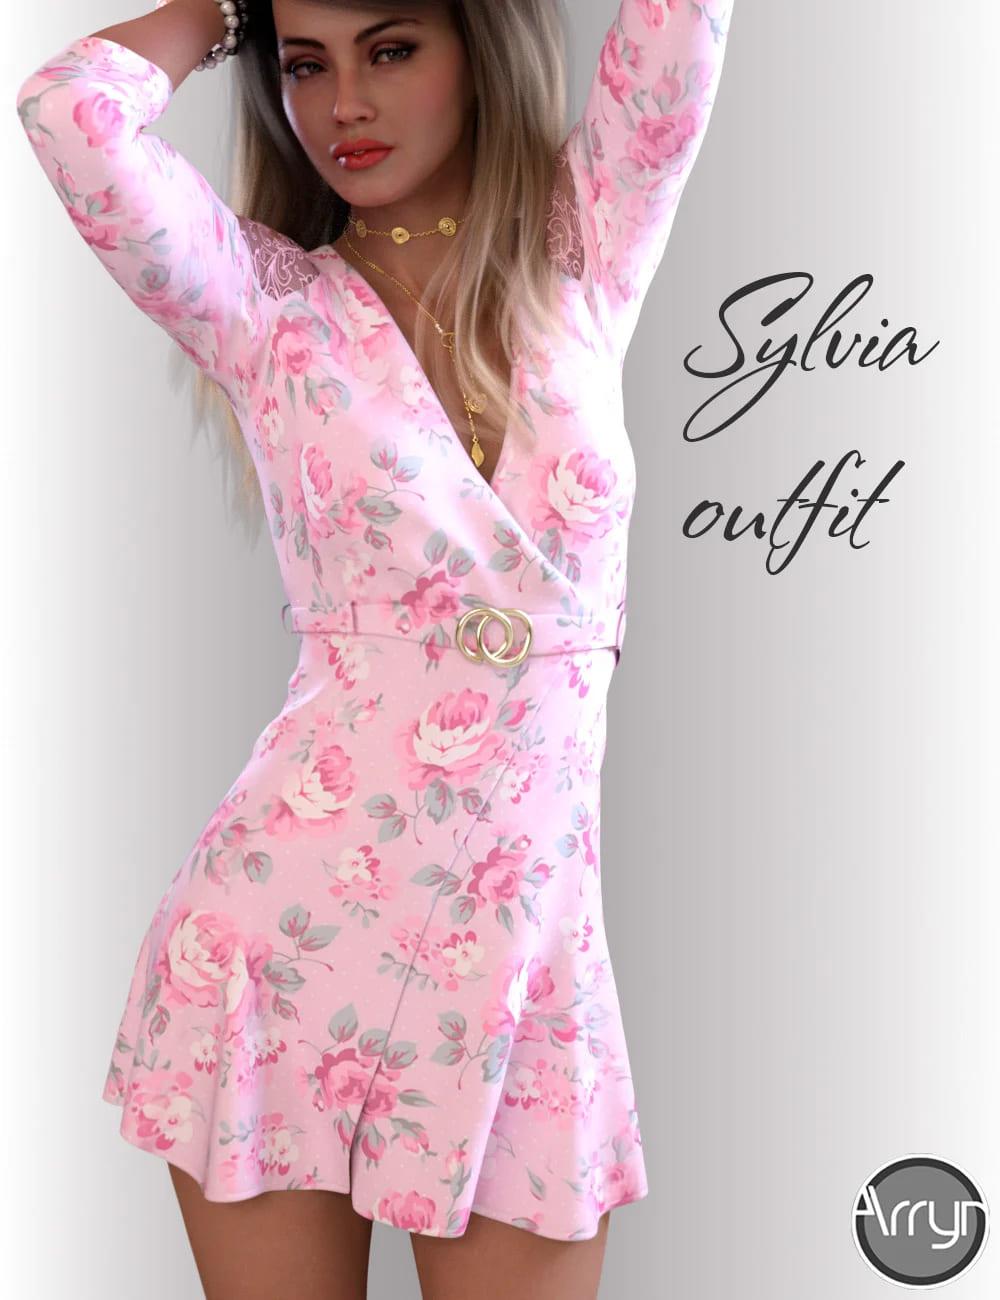 dForce Sylvia Outfit for Genesis 8 Female(s)_DAZ3D下载站